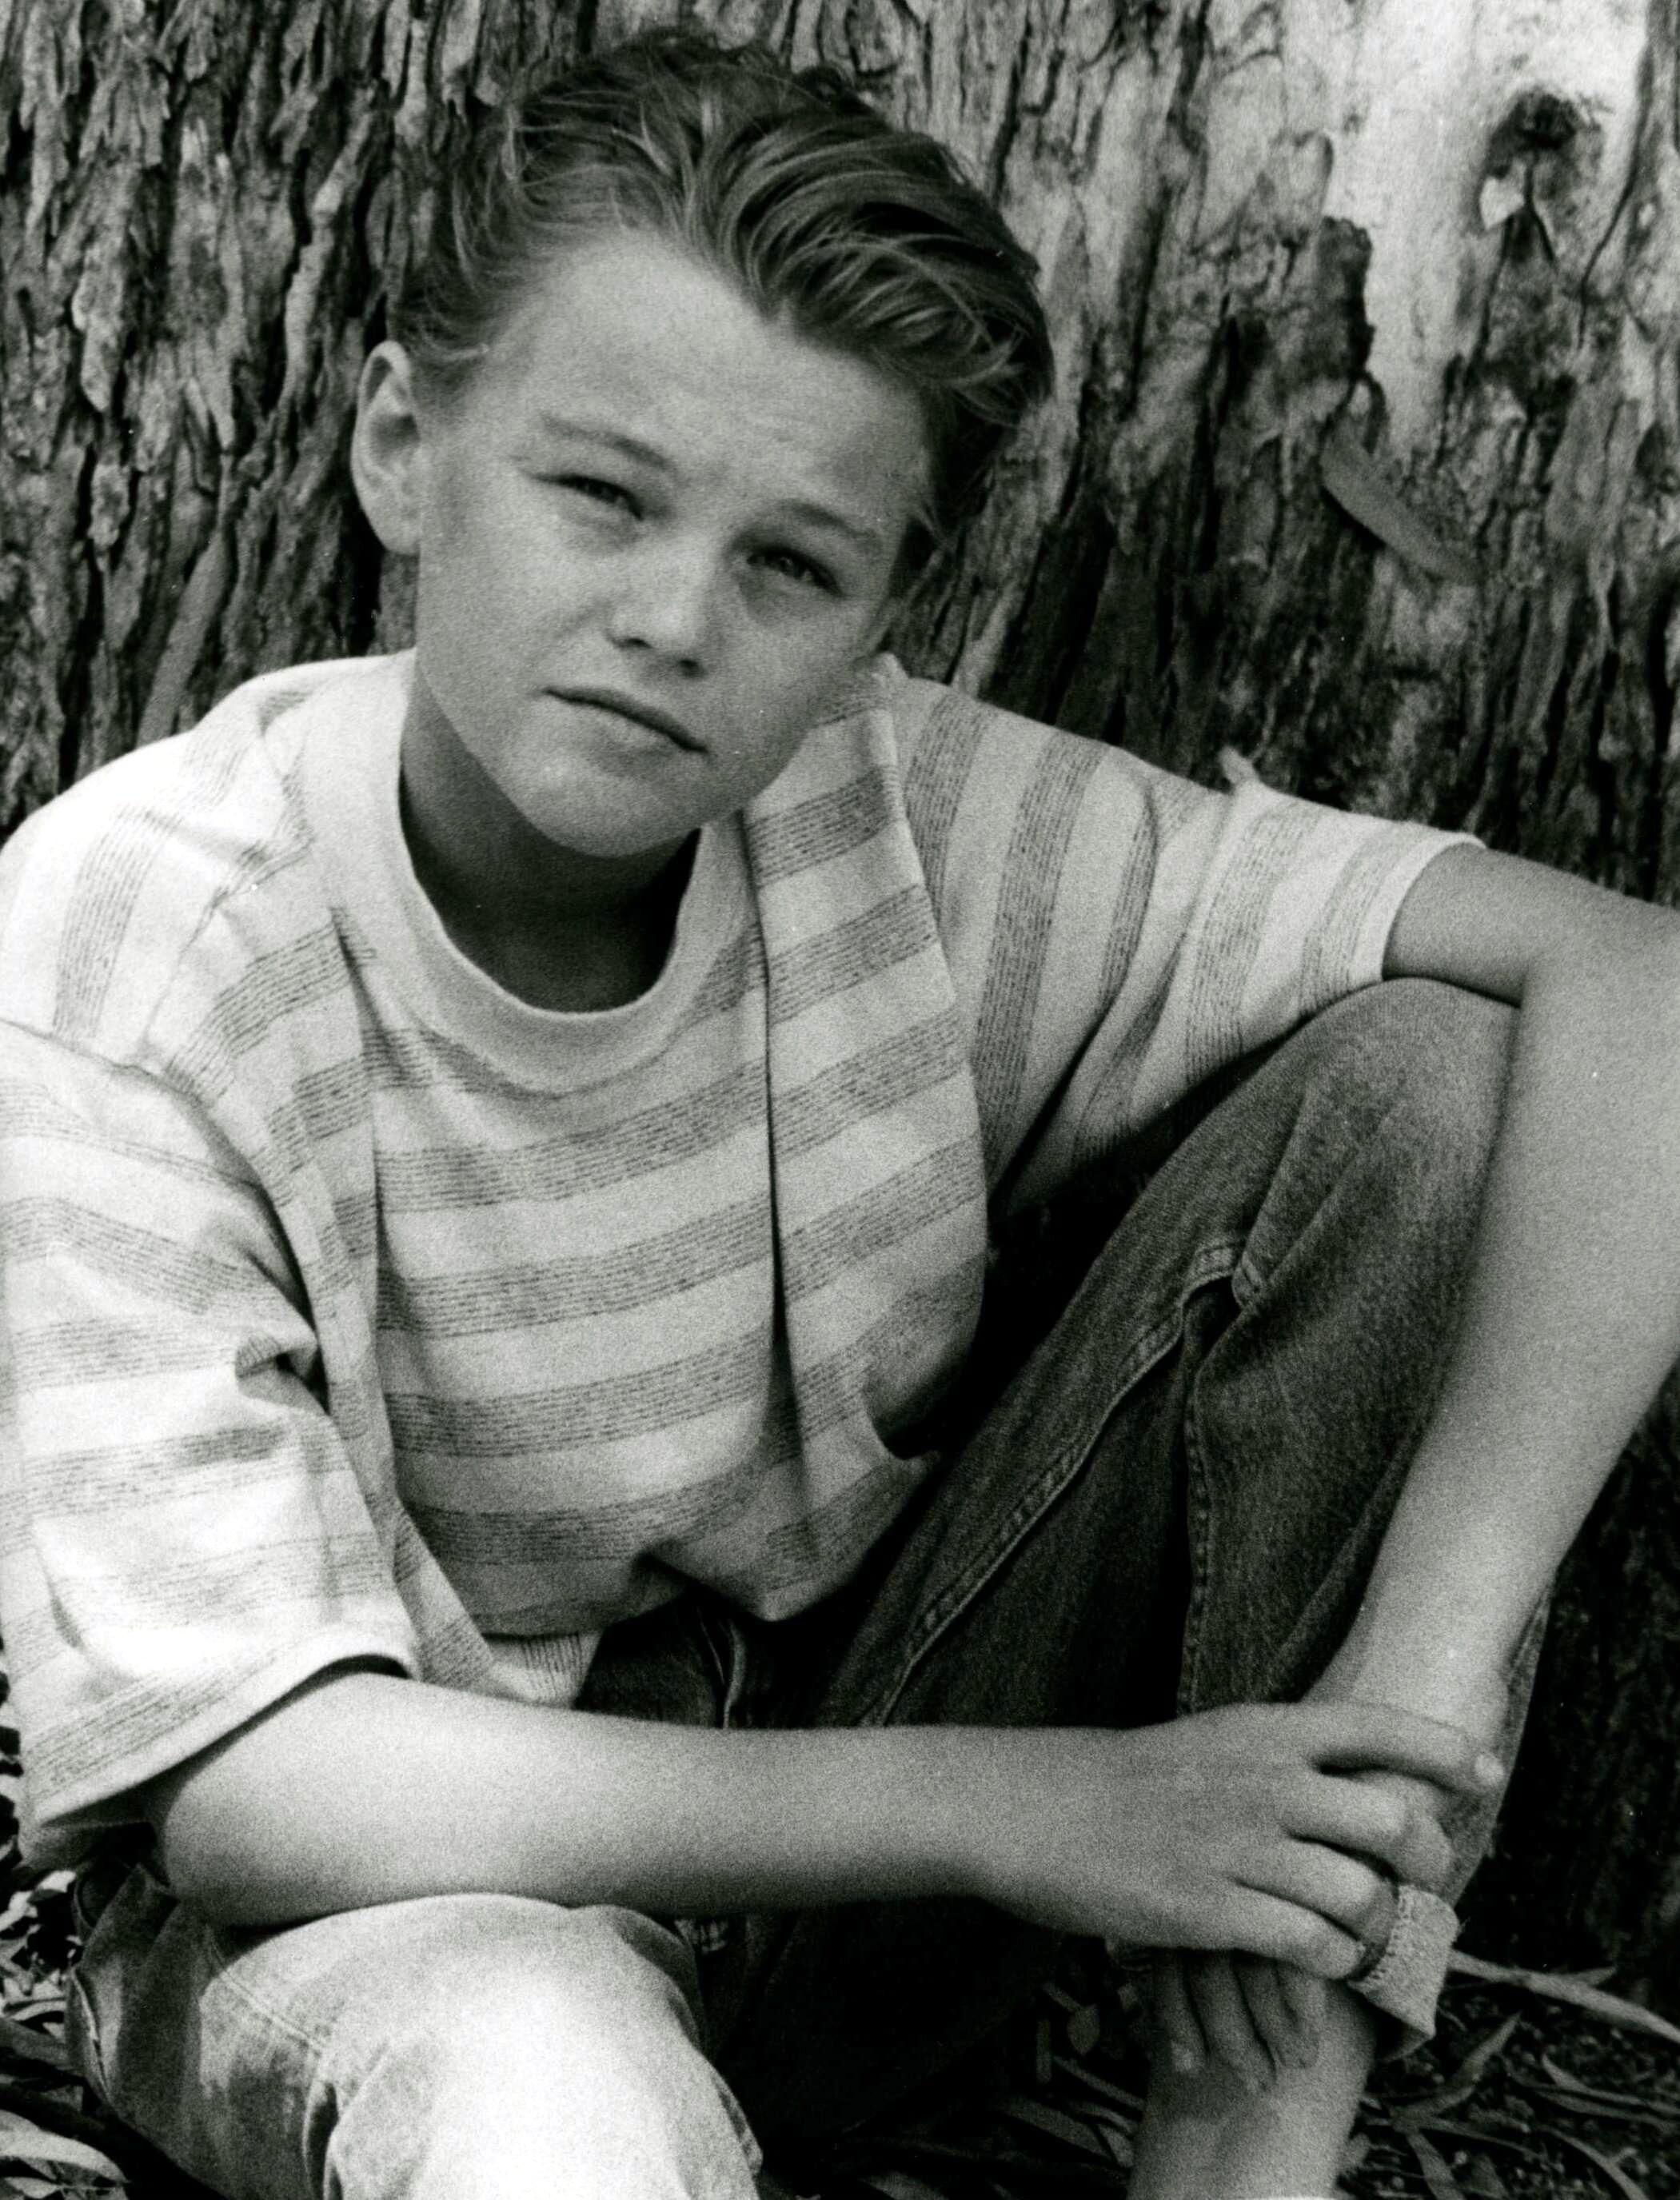 Leonardo DiCaprio in Los Angeles in Aug. 1990.